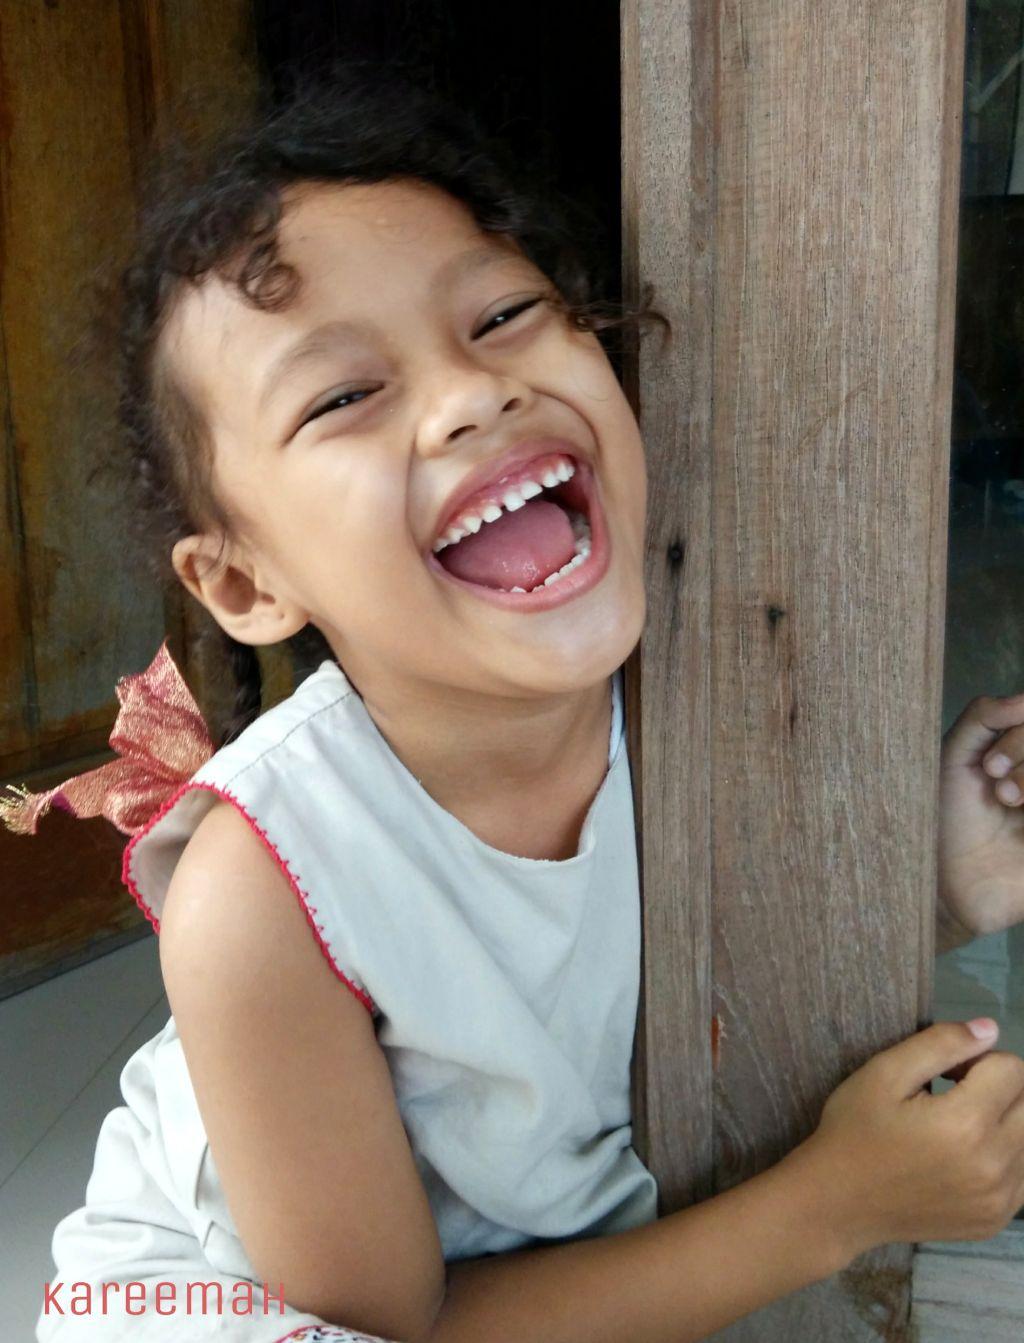 #happy #kids #cute